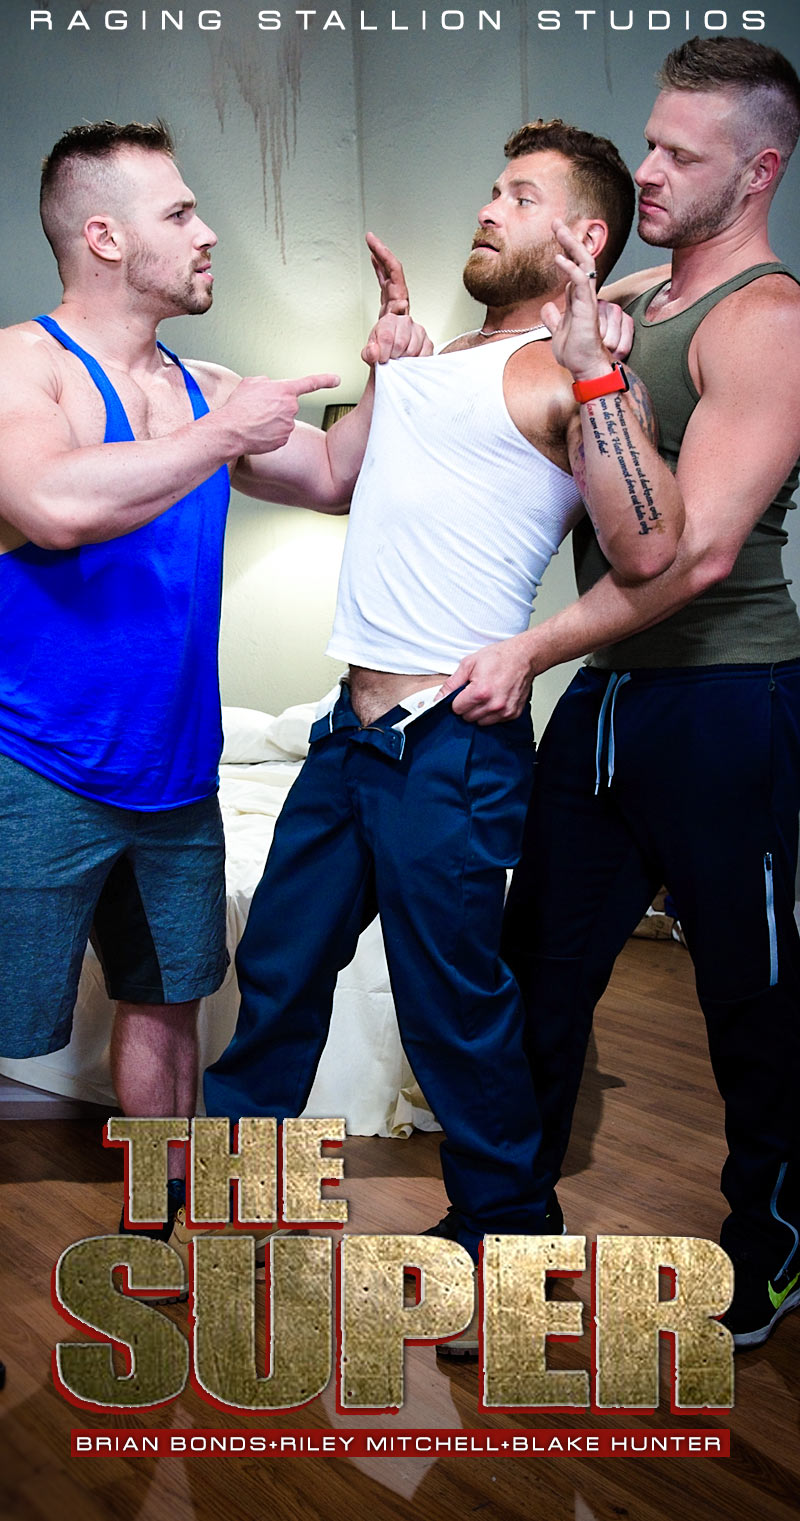 The Super, Scene 6 (Brian Bonds, Riley Mitchell and Blake Hunter) at Raging Stallion